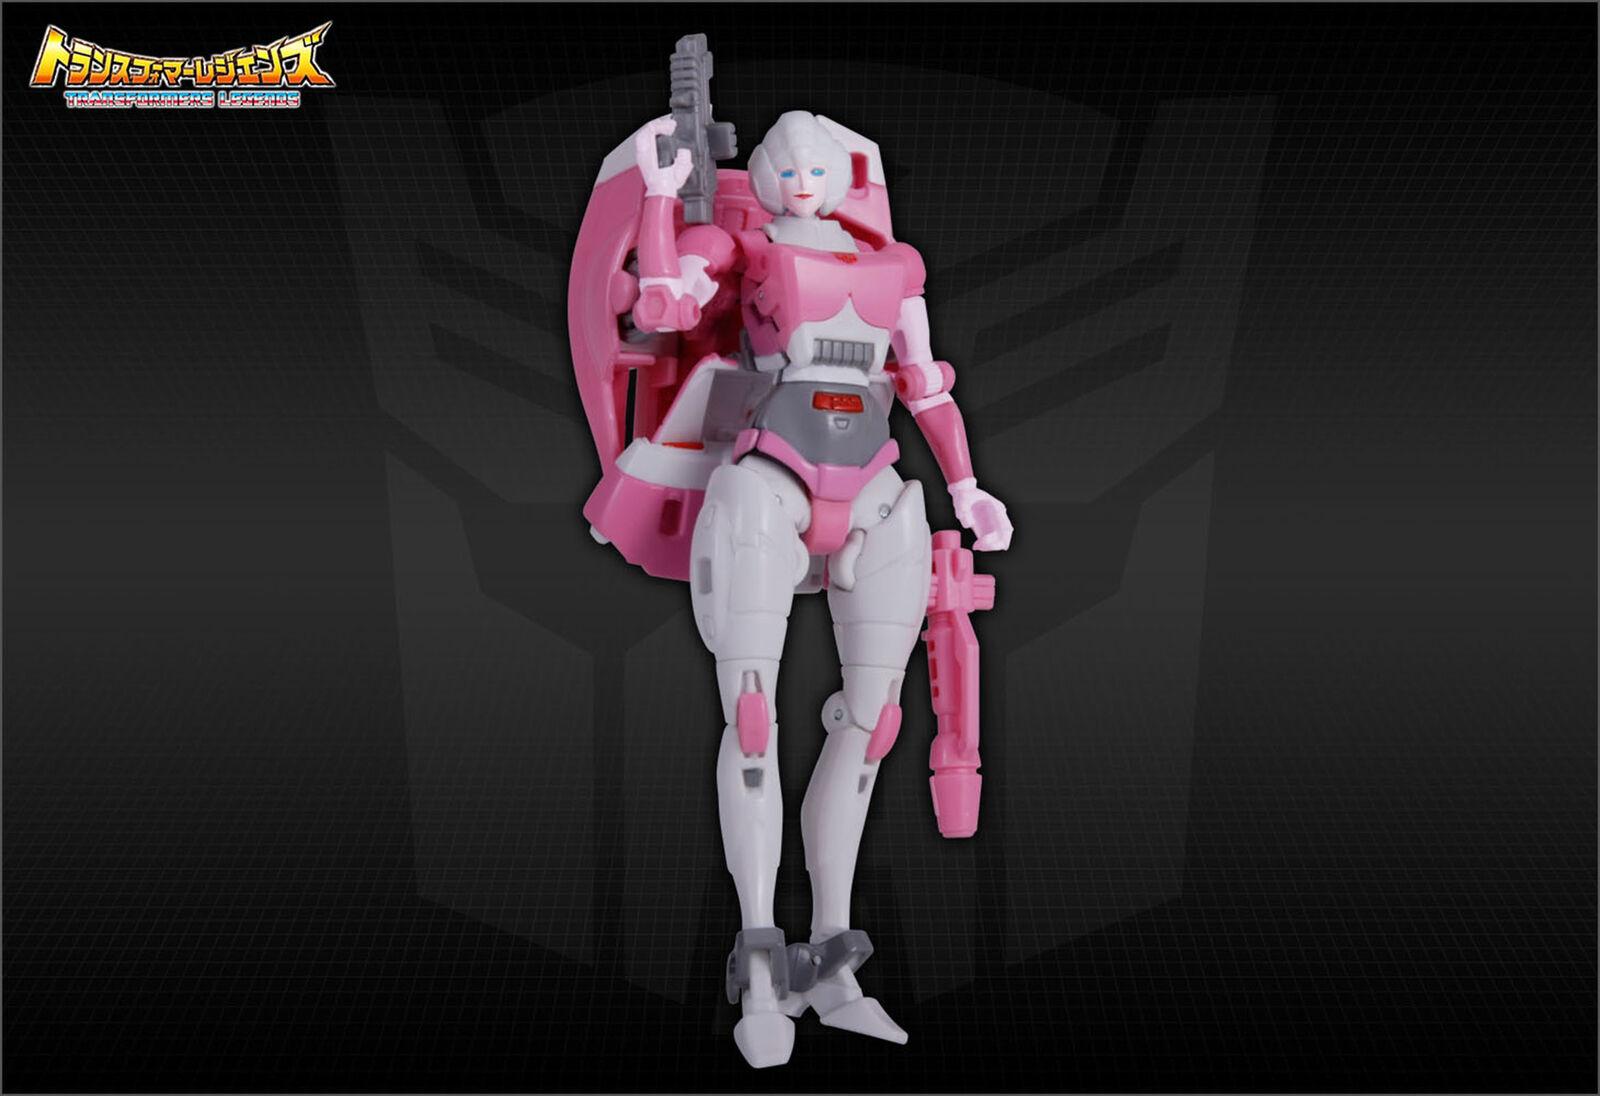 Transformers Legends LG10 ARCEE ARCEE ARCEE IDW Action Figure Gift Christmas Toy Autobots 5b4db8